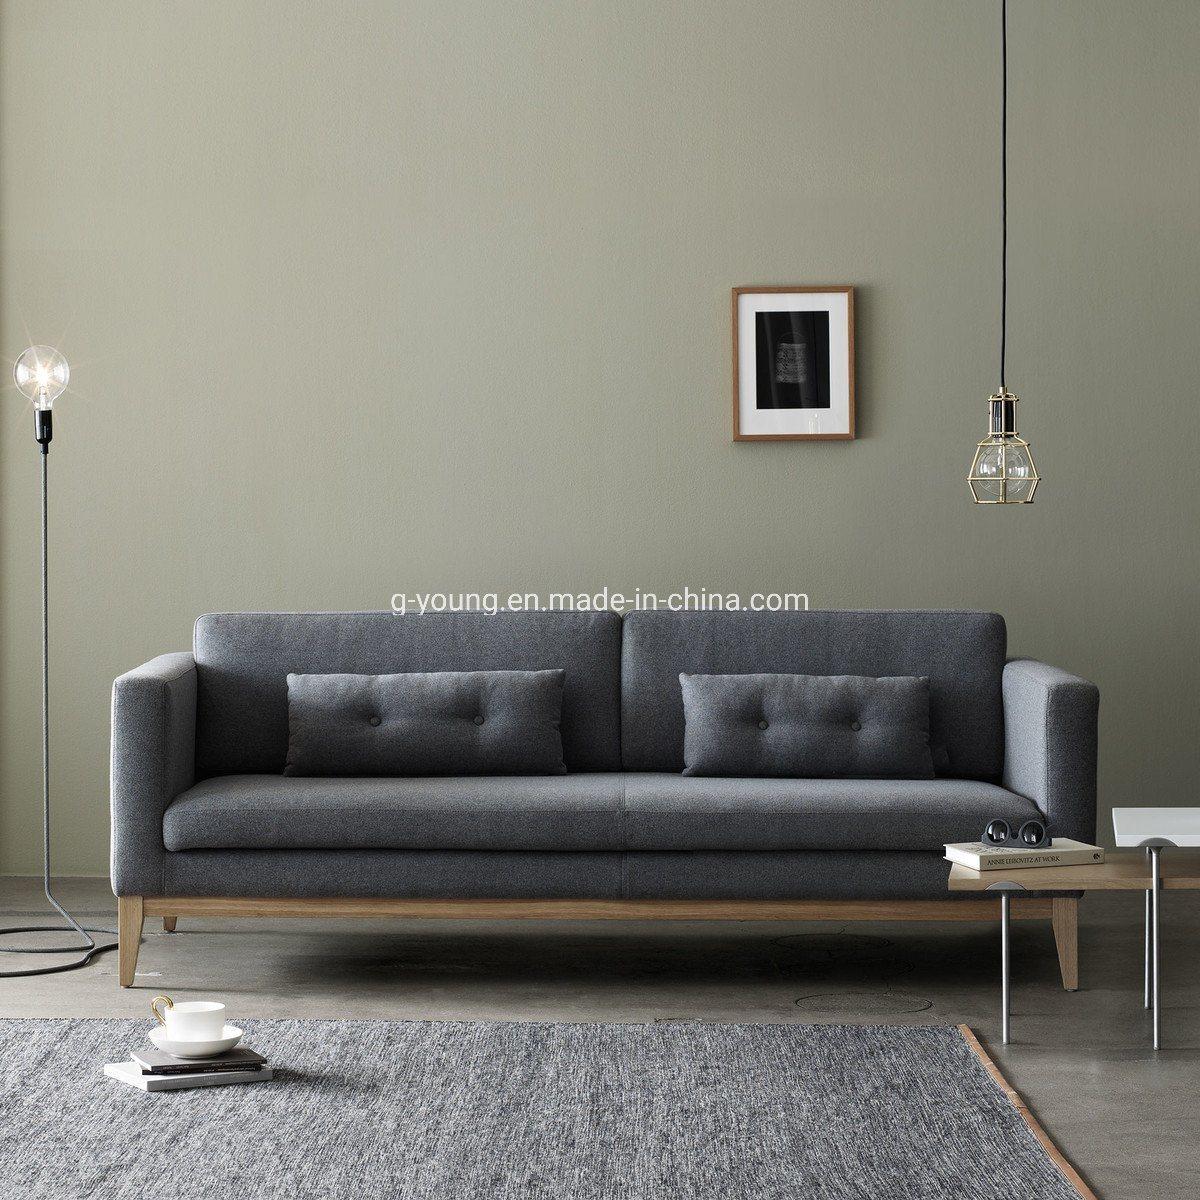 [Hot Item] Simple Sofa Set Home Furniture Living Room Sofa